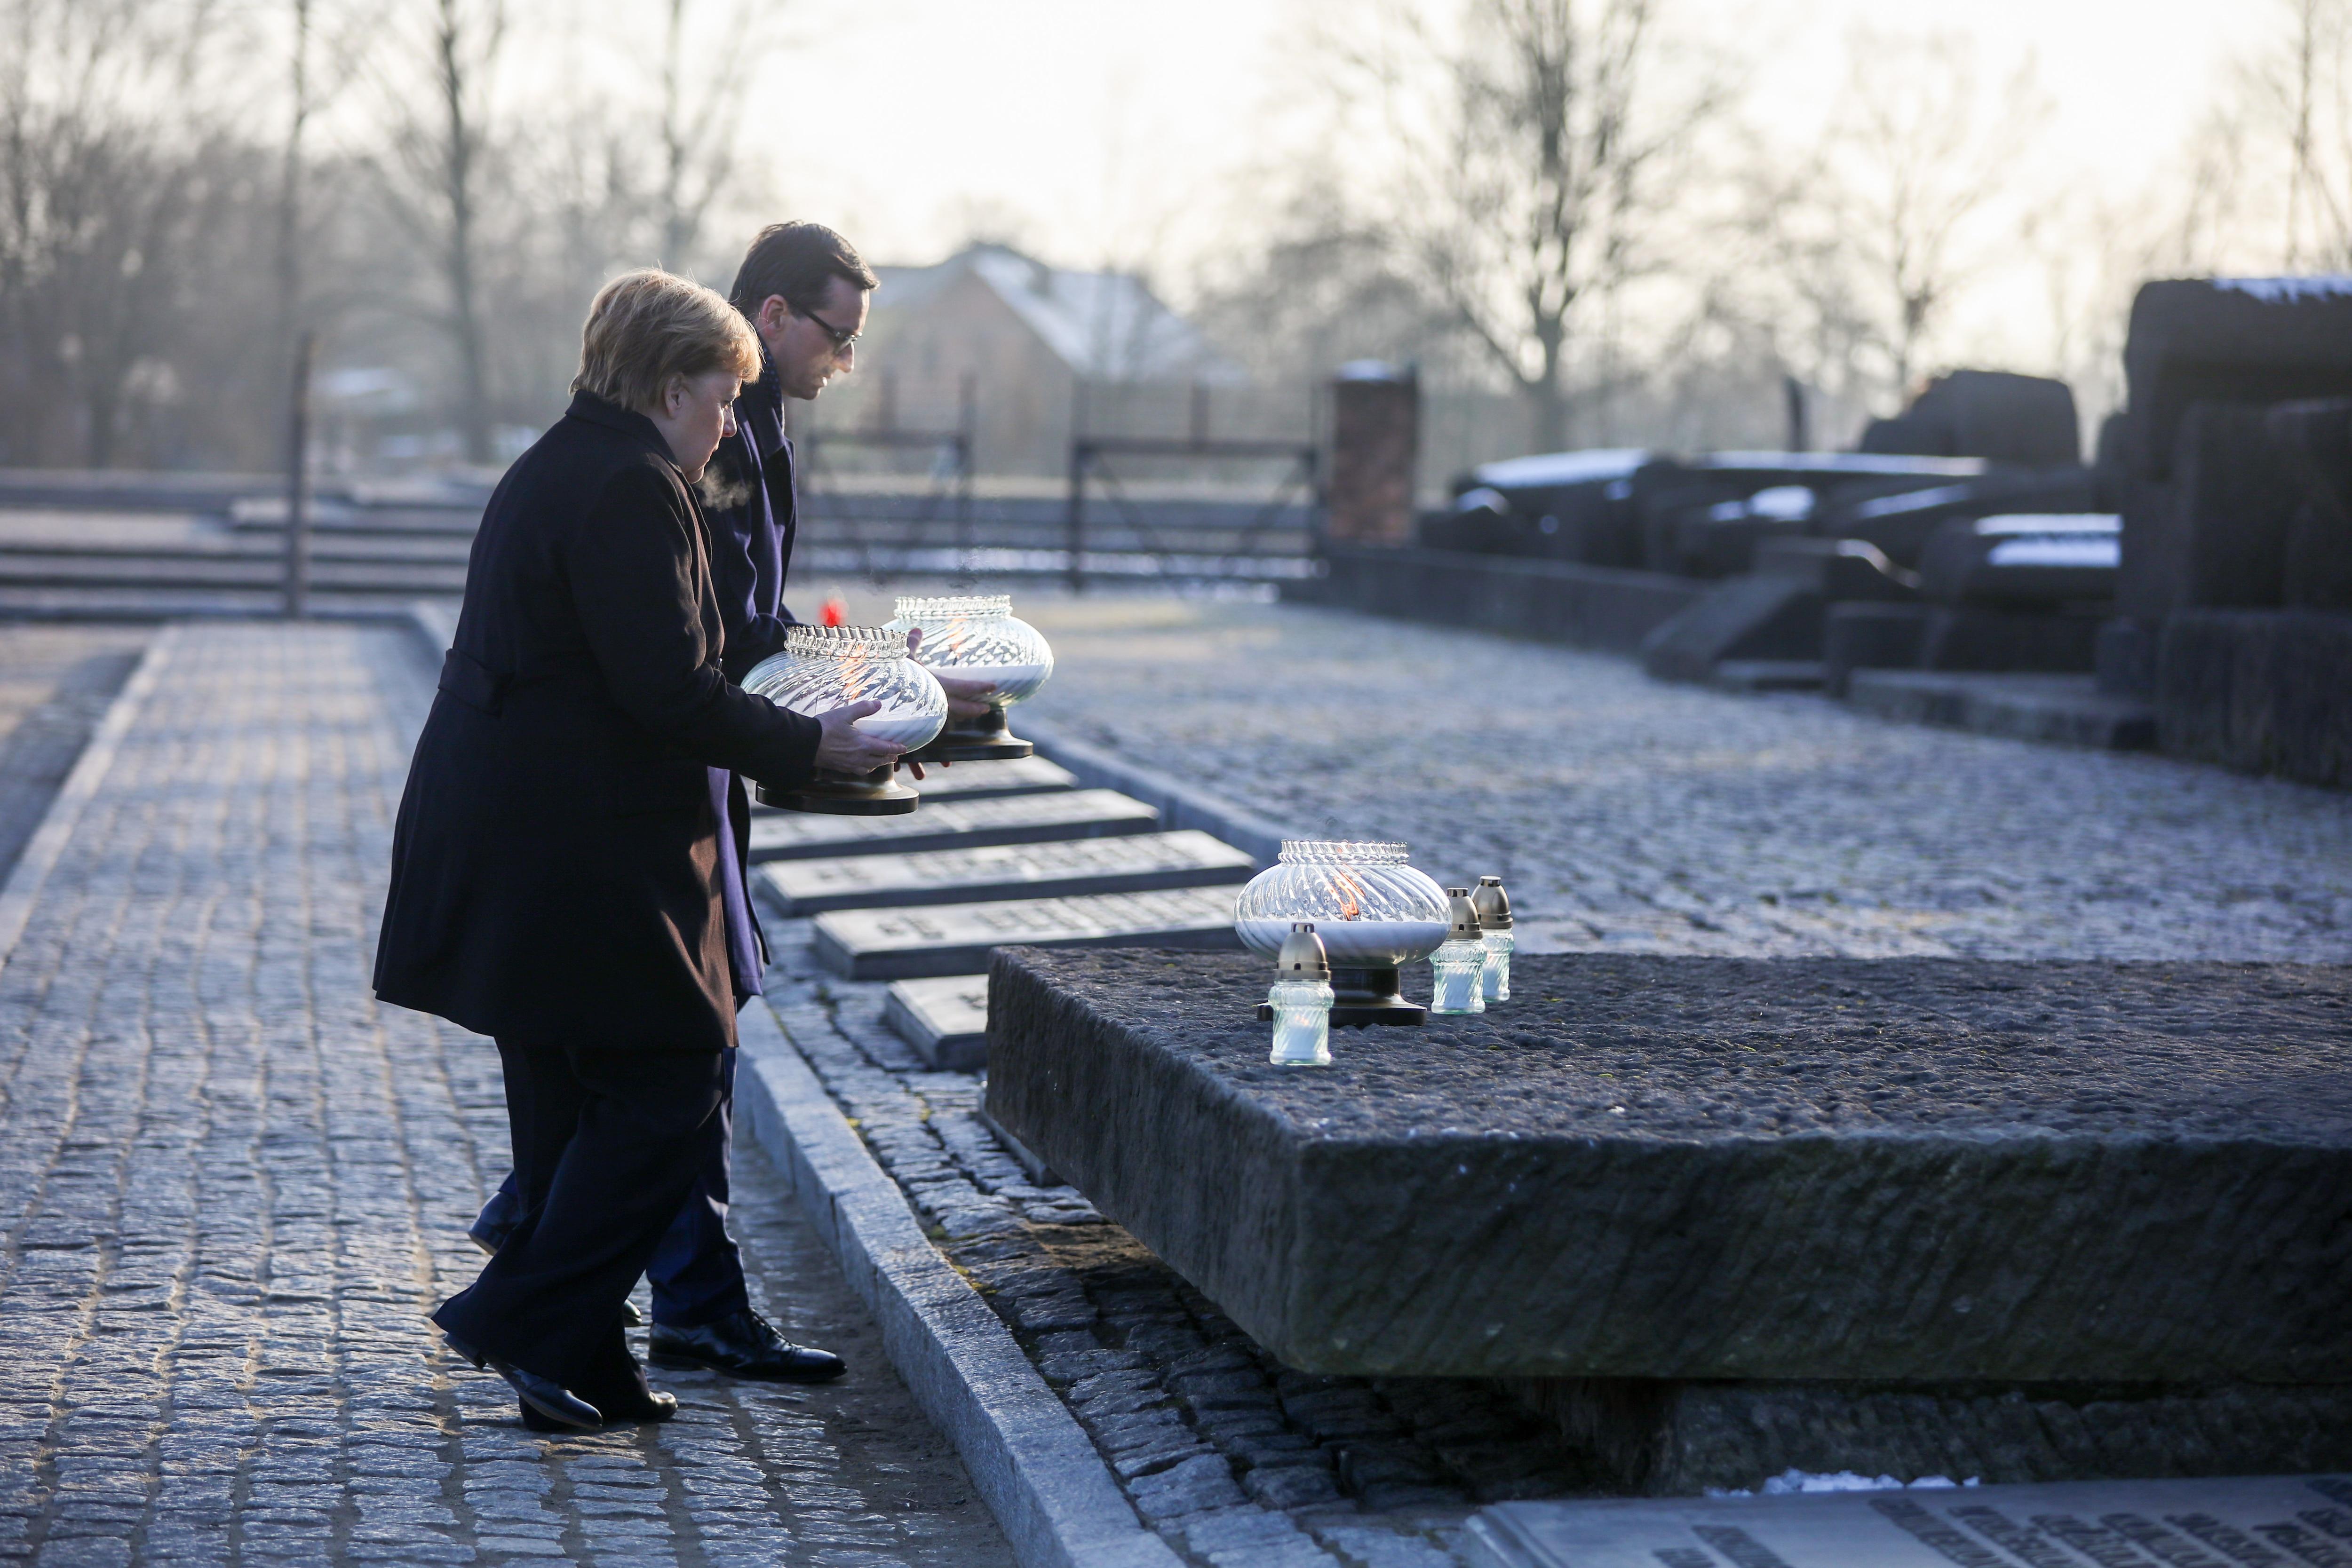 German Chancellor Angela Merkel visits the former Nazi death camp of Auschwitz.